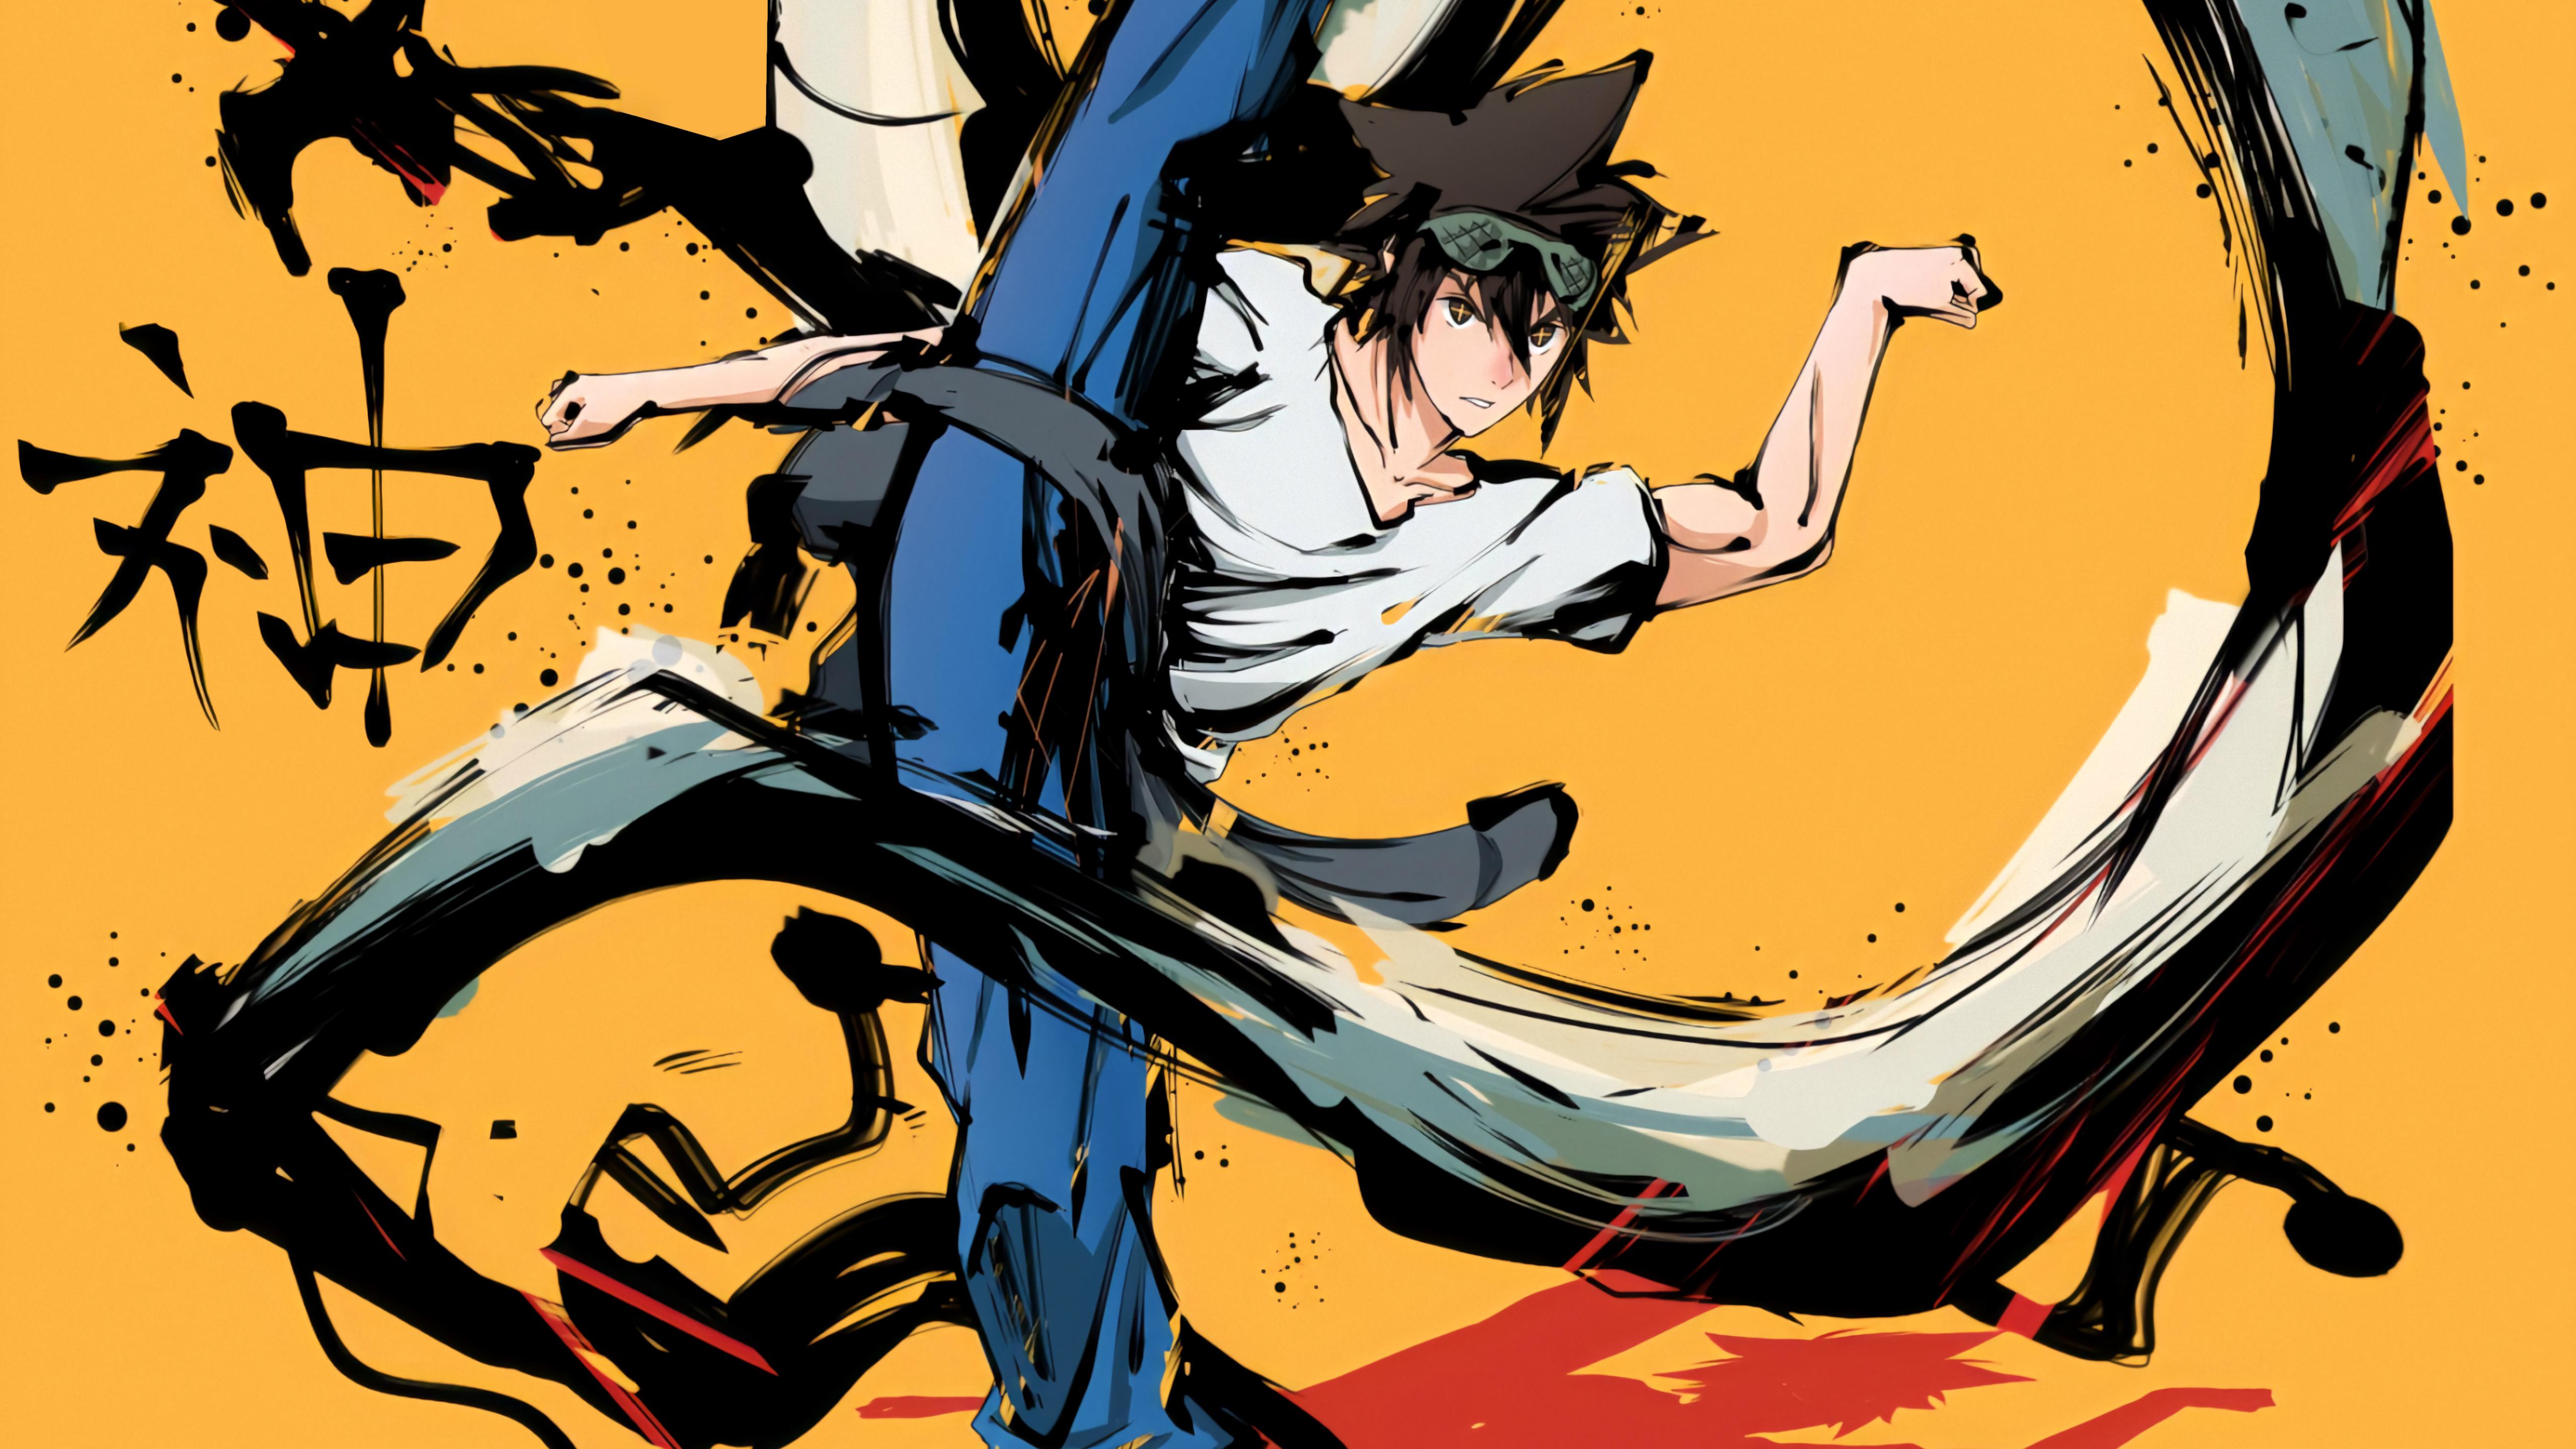 [FICHA] - Akashi The-god-of-high-school-jin-mori_72420_5120x2880